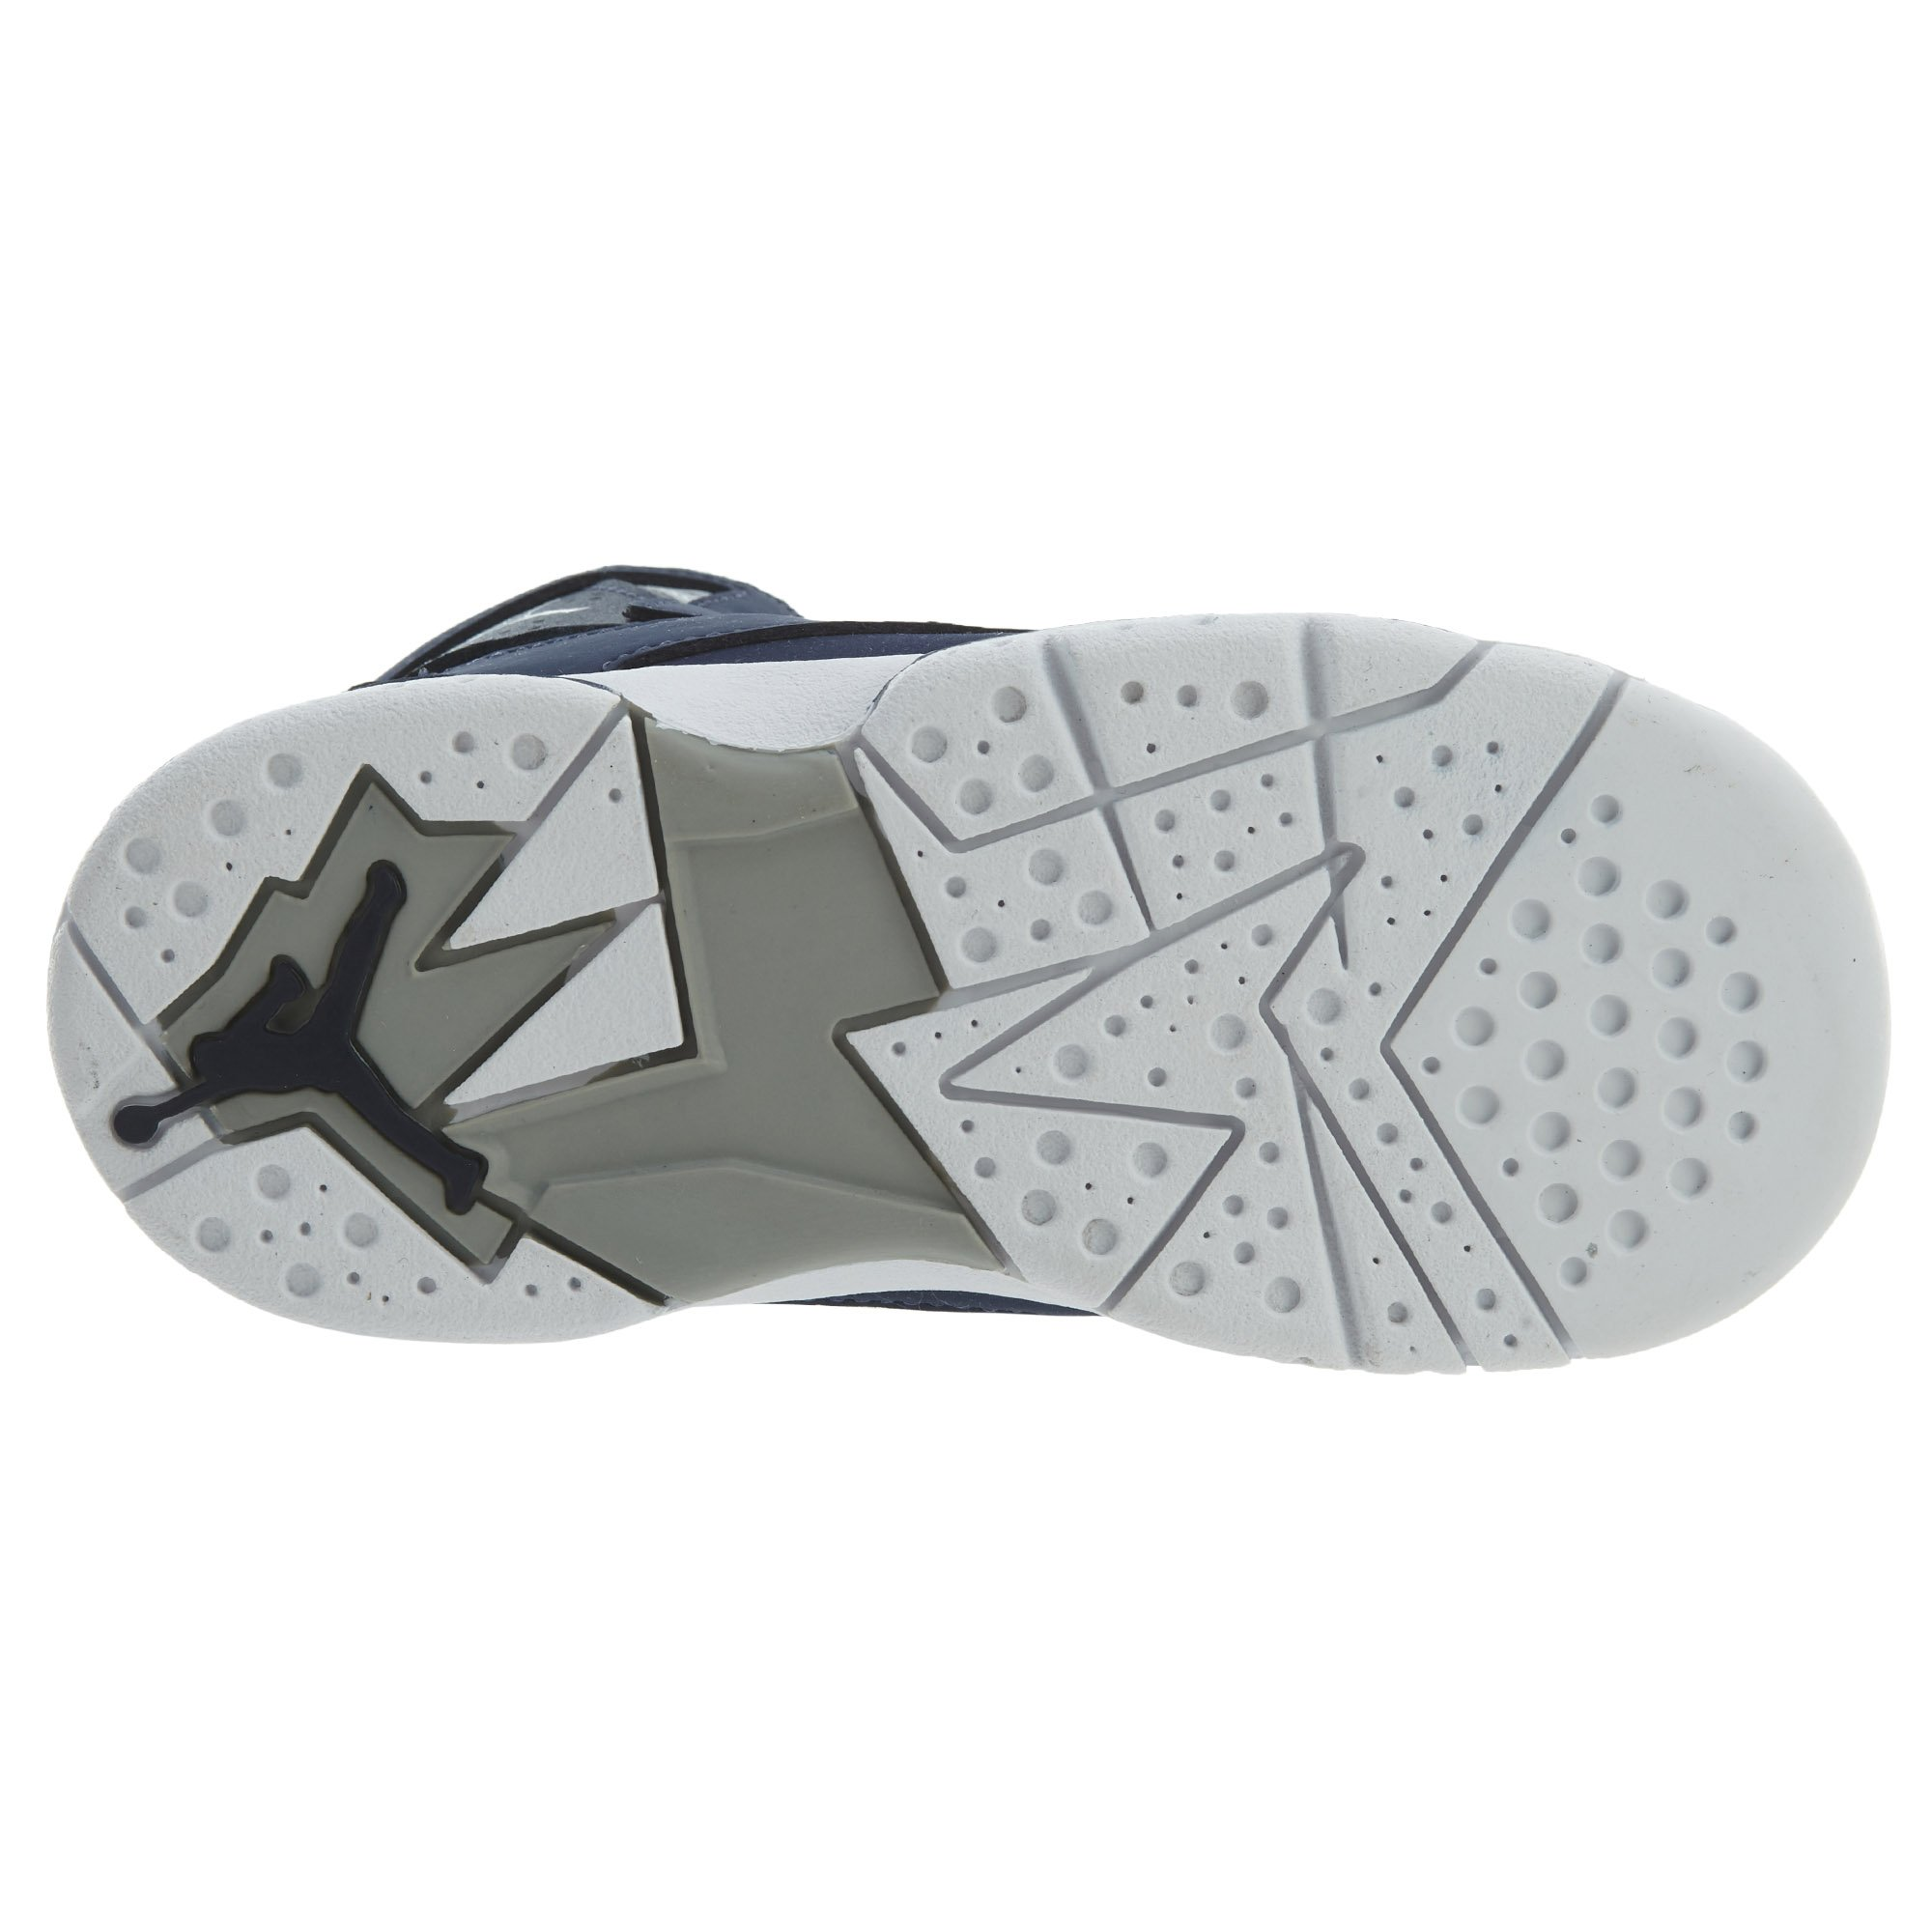 a4da094cfa091 Jordan Nike 343797-404 :Air True Flight Boy's Toddlers Sneakers (7 M ...